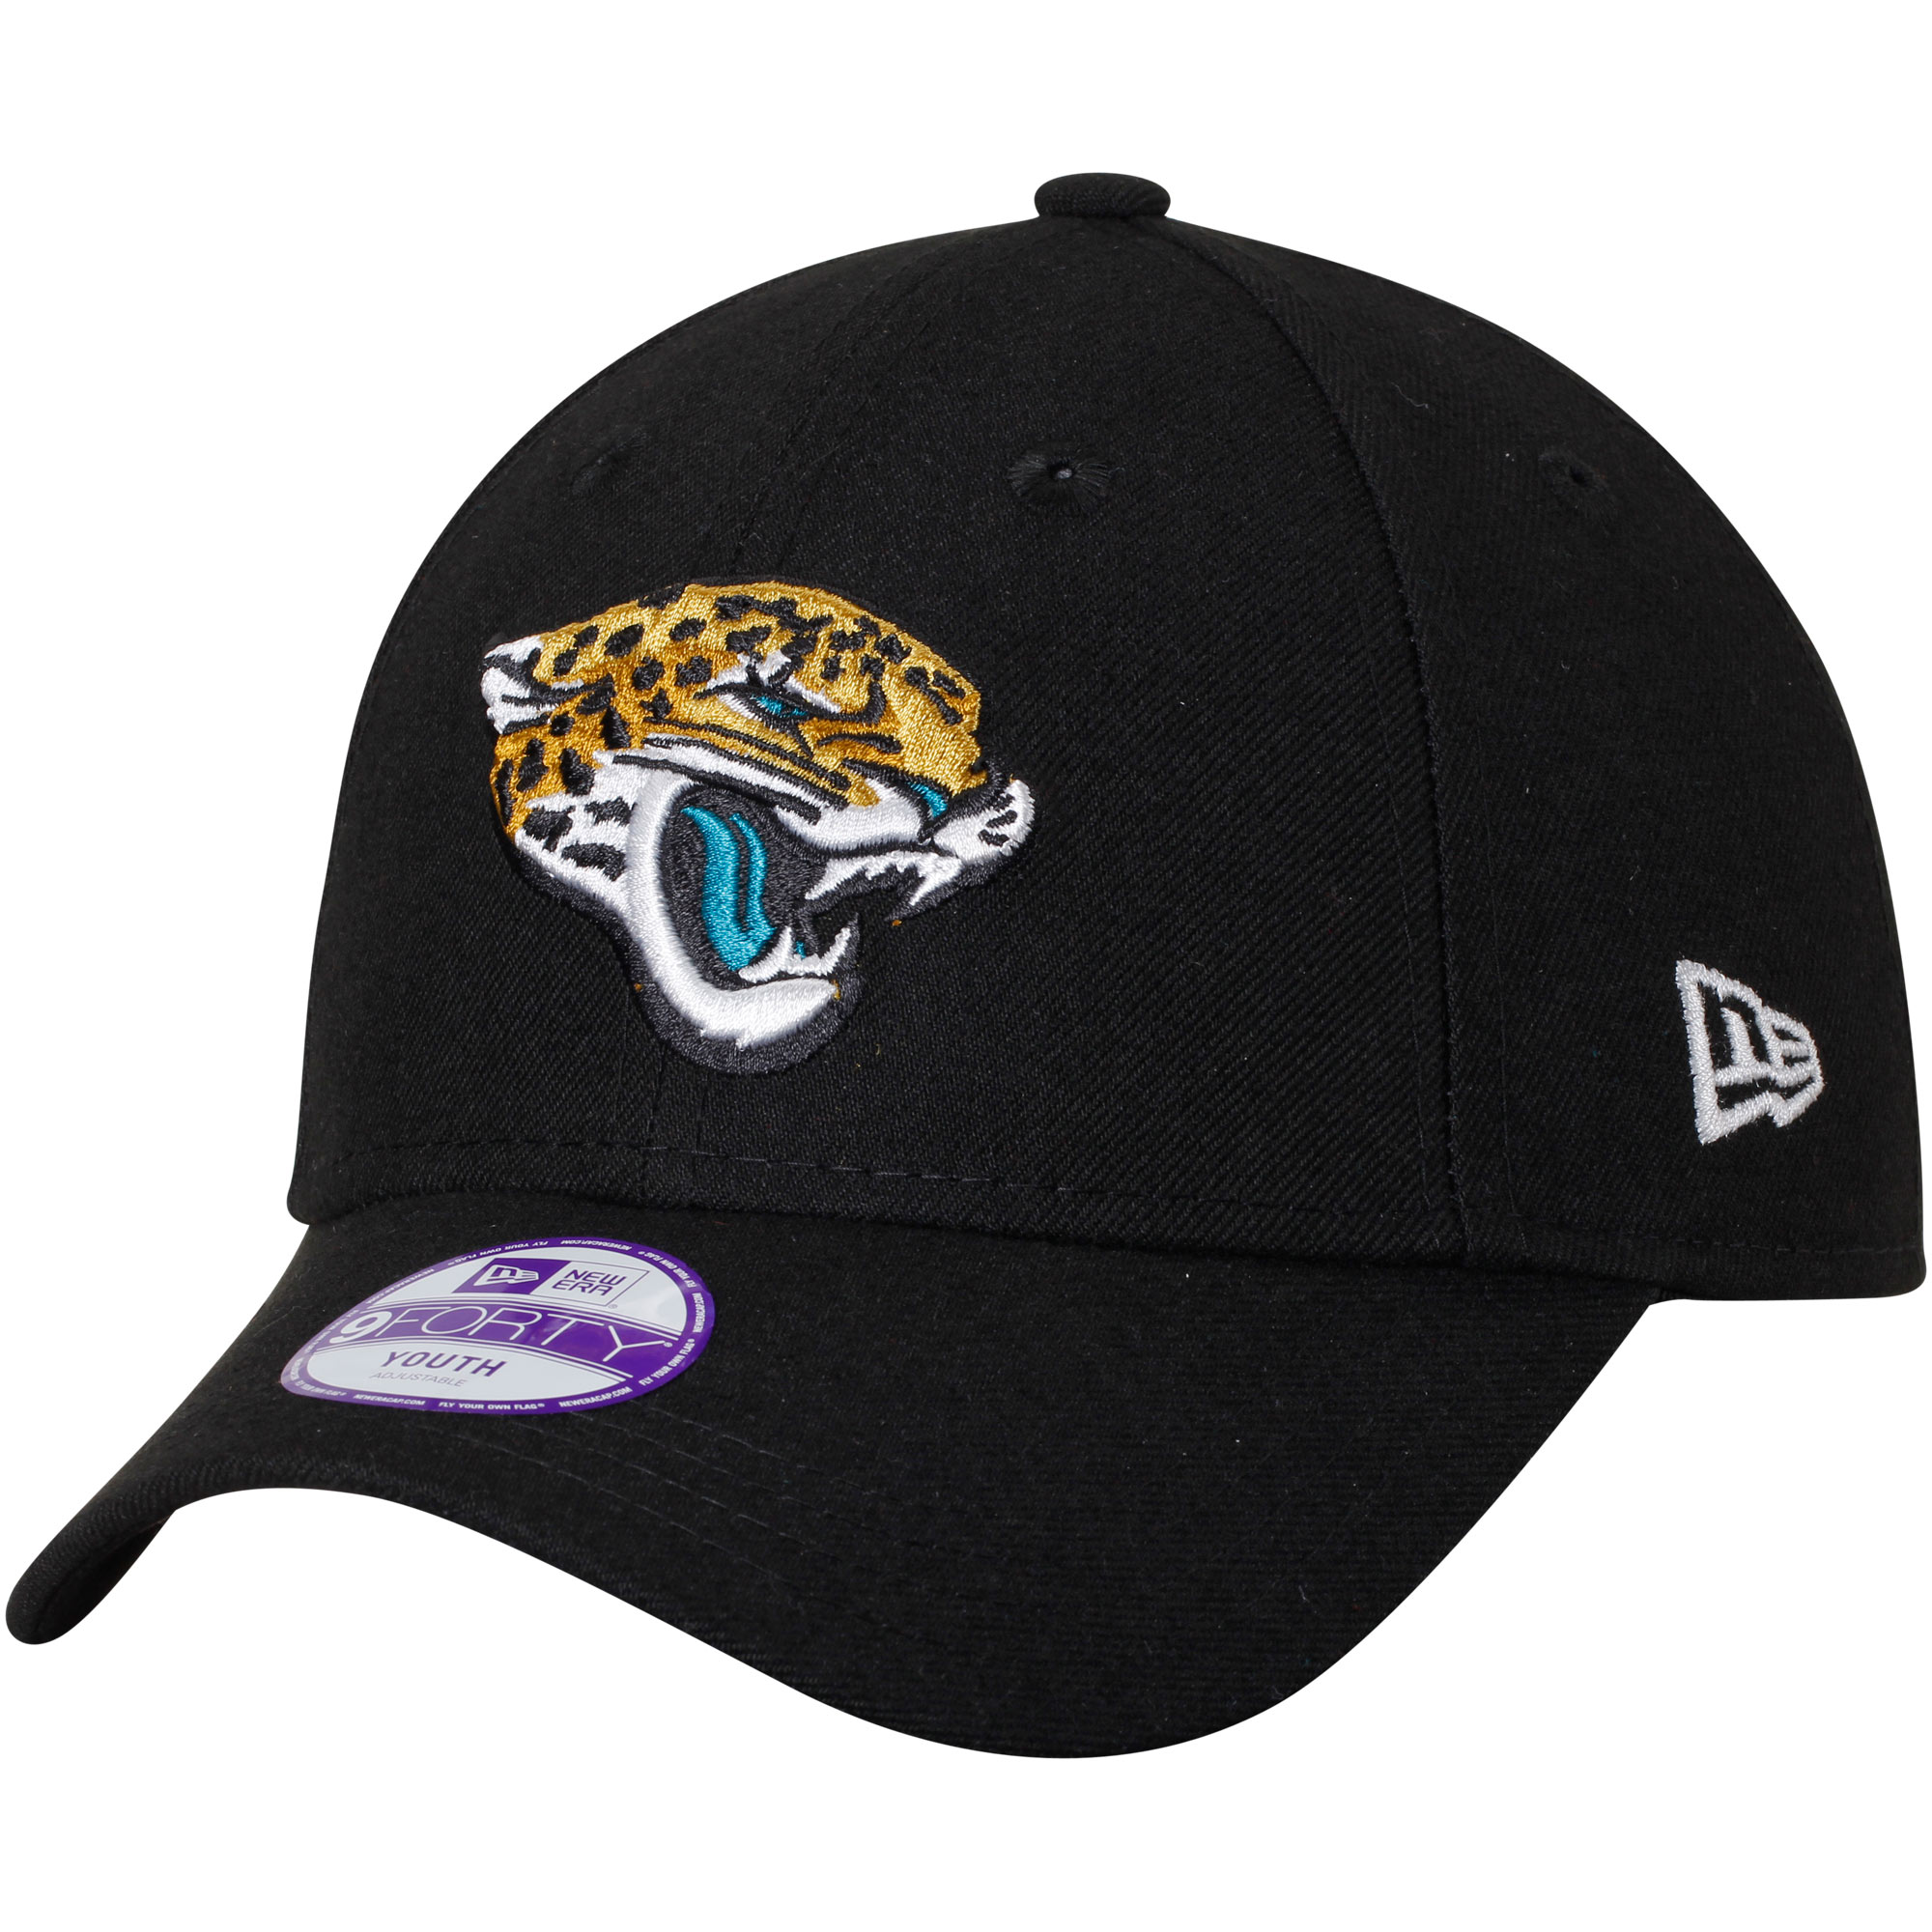 Jacksonville Jaguars New Era Youth League 9FORTY Adjustable Hat - Black